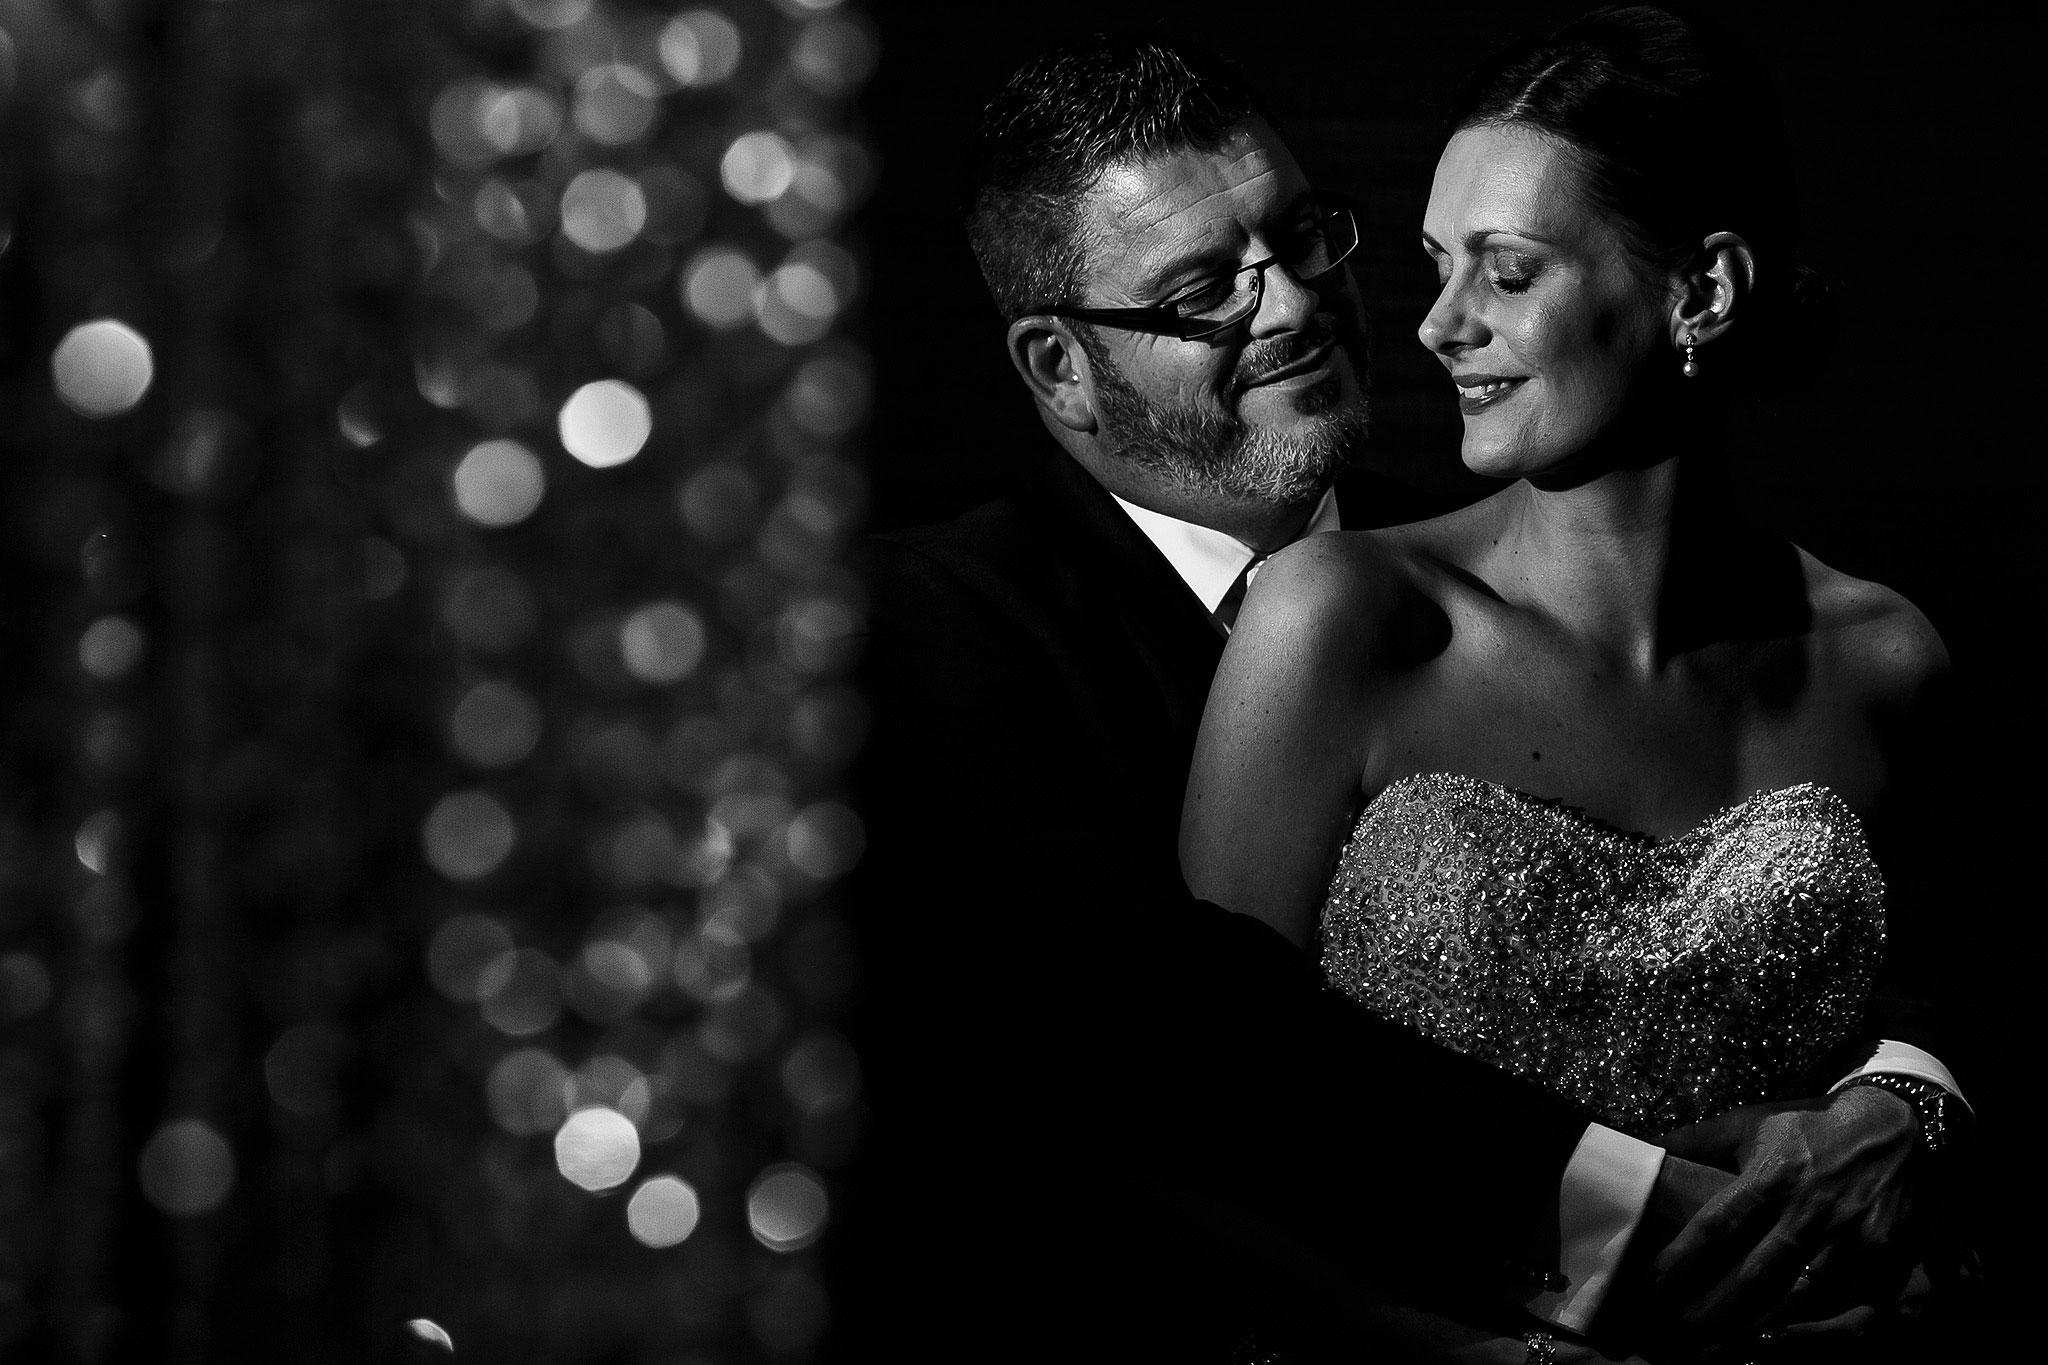 Creative wedding portrait using off camera flash at Stanley House Hotel wedding reception